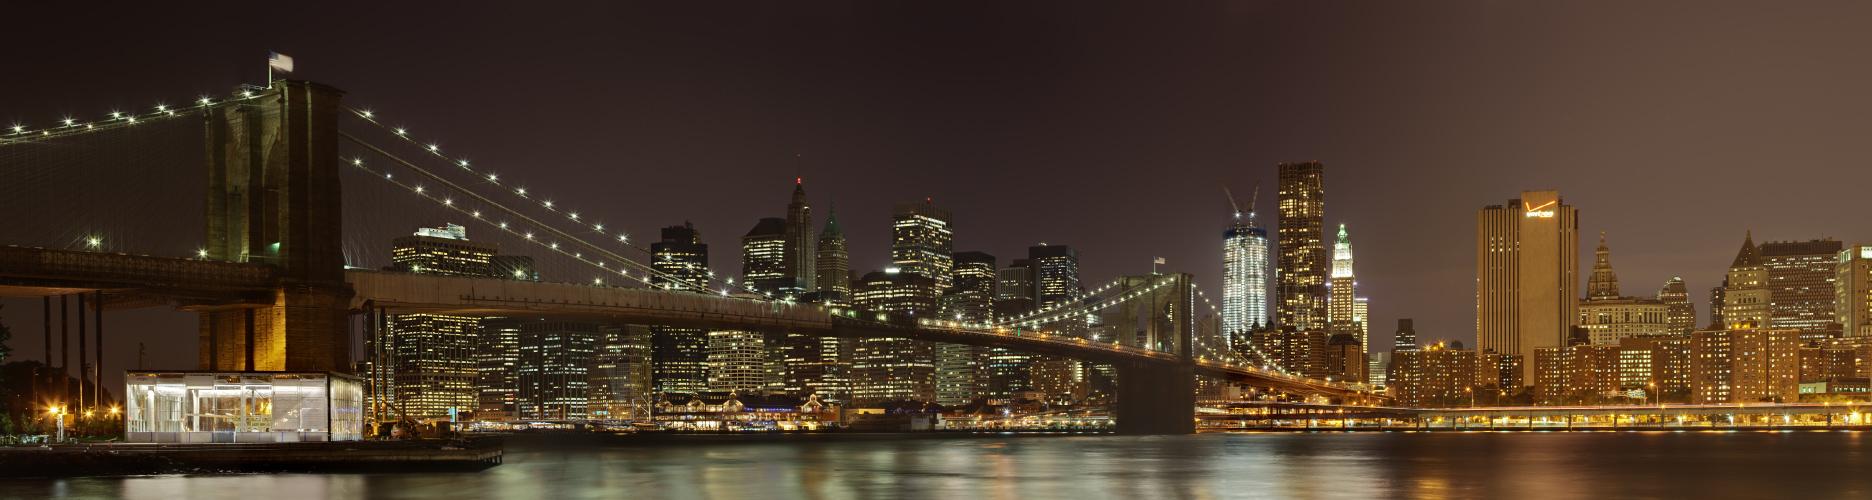 NYC - Brooklyn Bridge Night